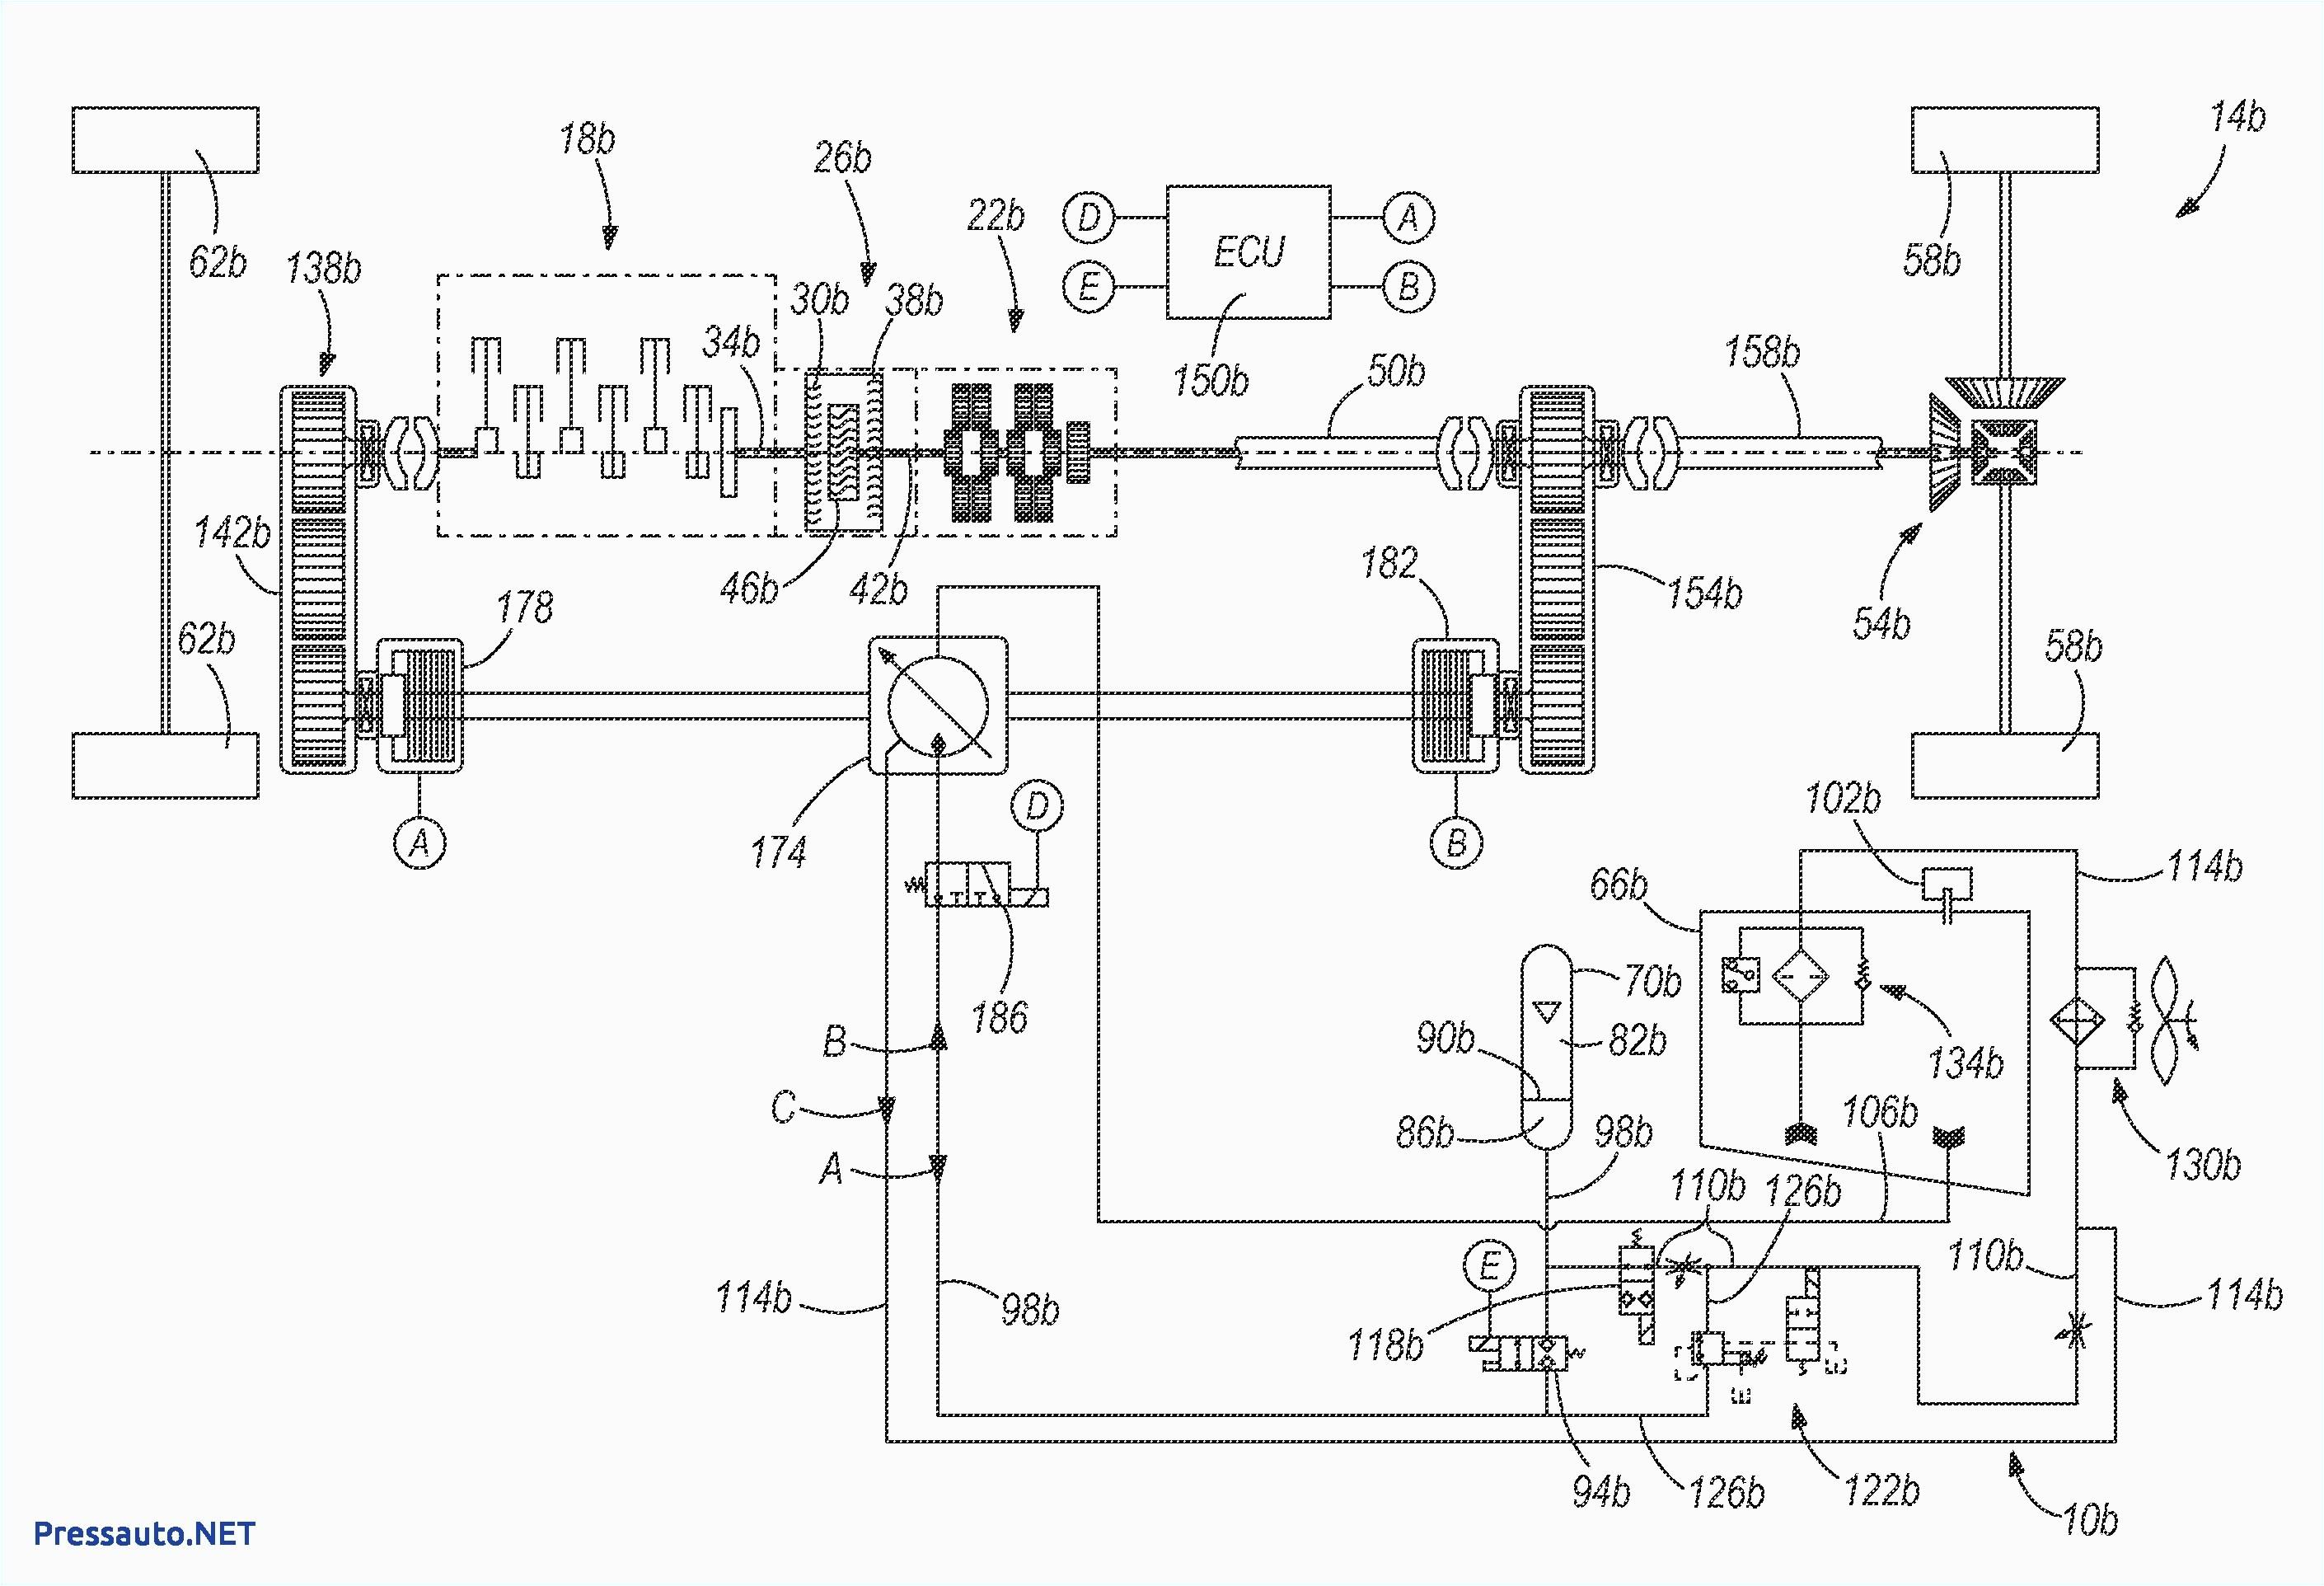 2000 international 4900 wiring diagram unique international 4900 wiring diagram image of 2000 international 4900 wiring diagram jpg